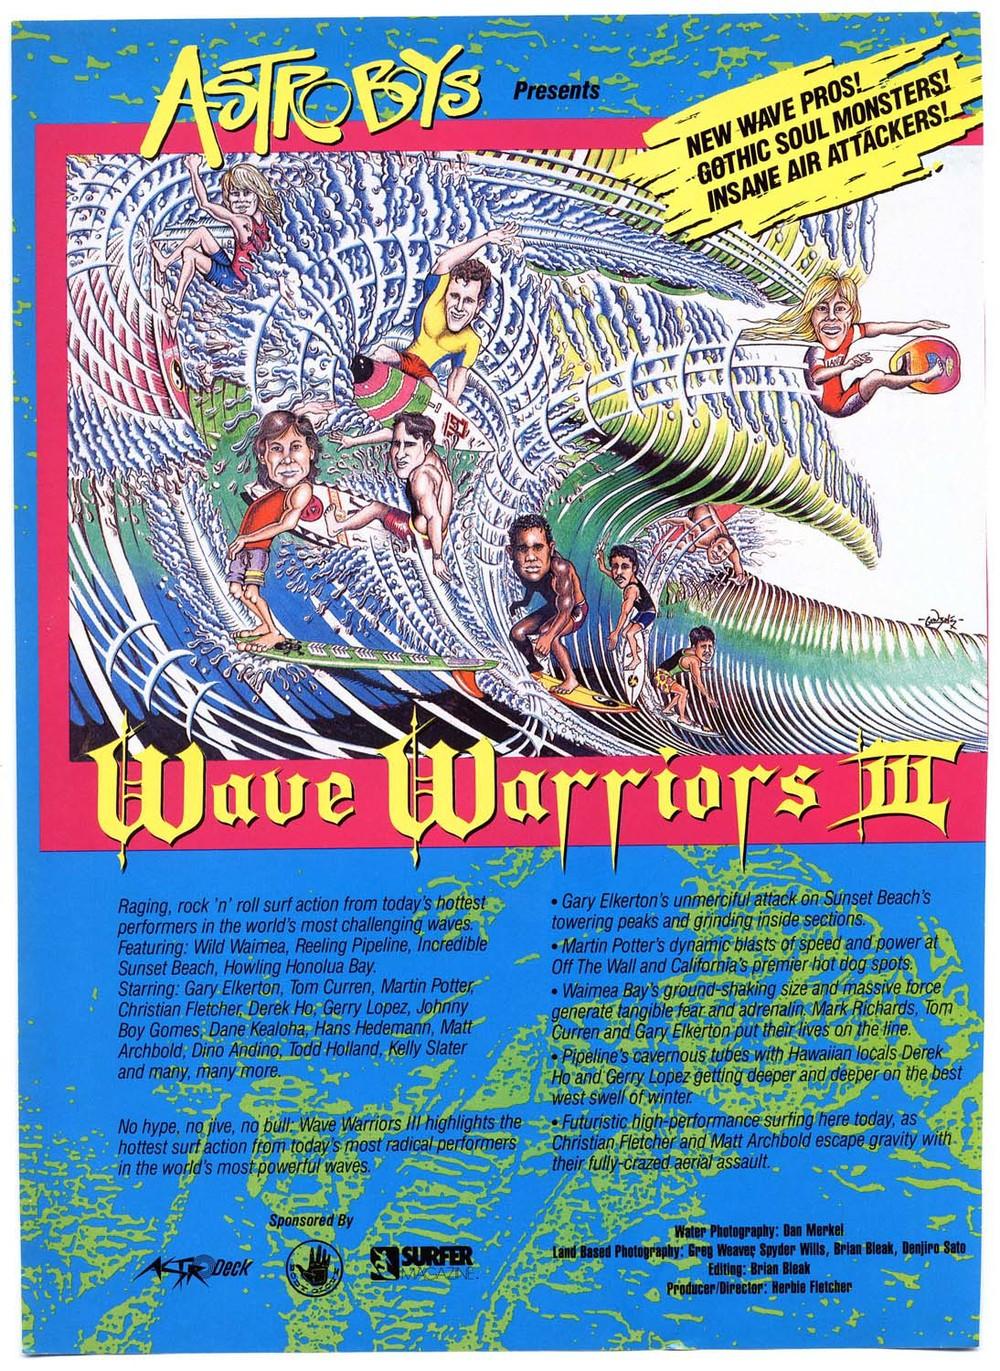 -1987-OLD-WW-AD-001-.jpg